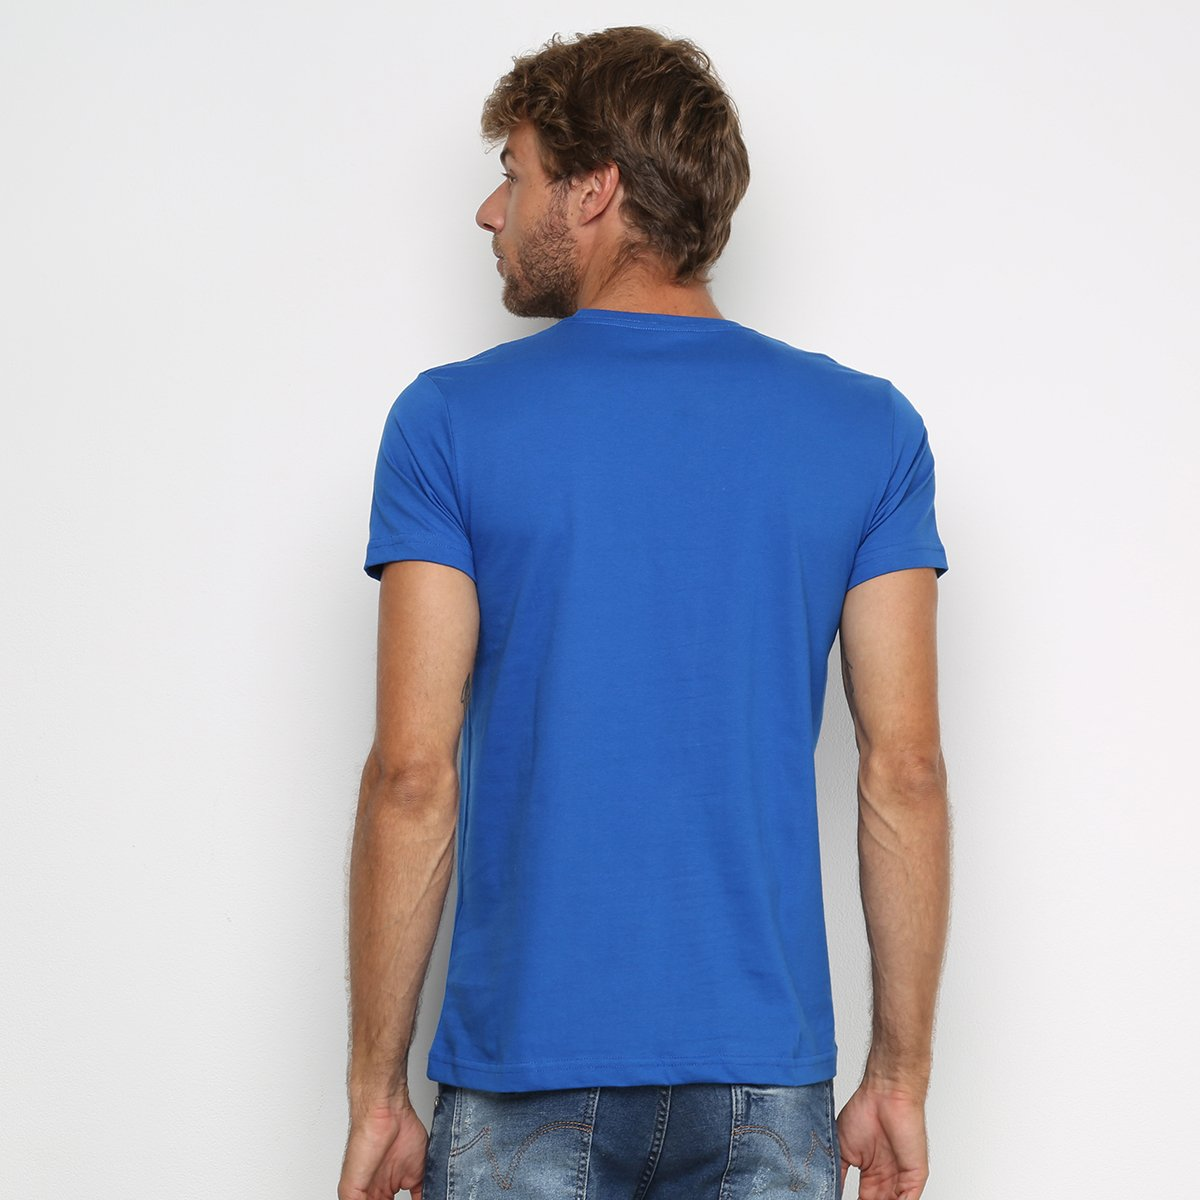 Camiseta Industrie Estampada Manga Curta Masculina - Azul Royal